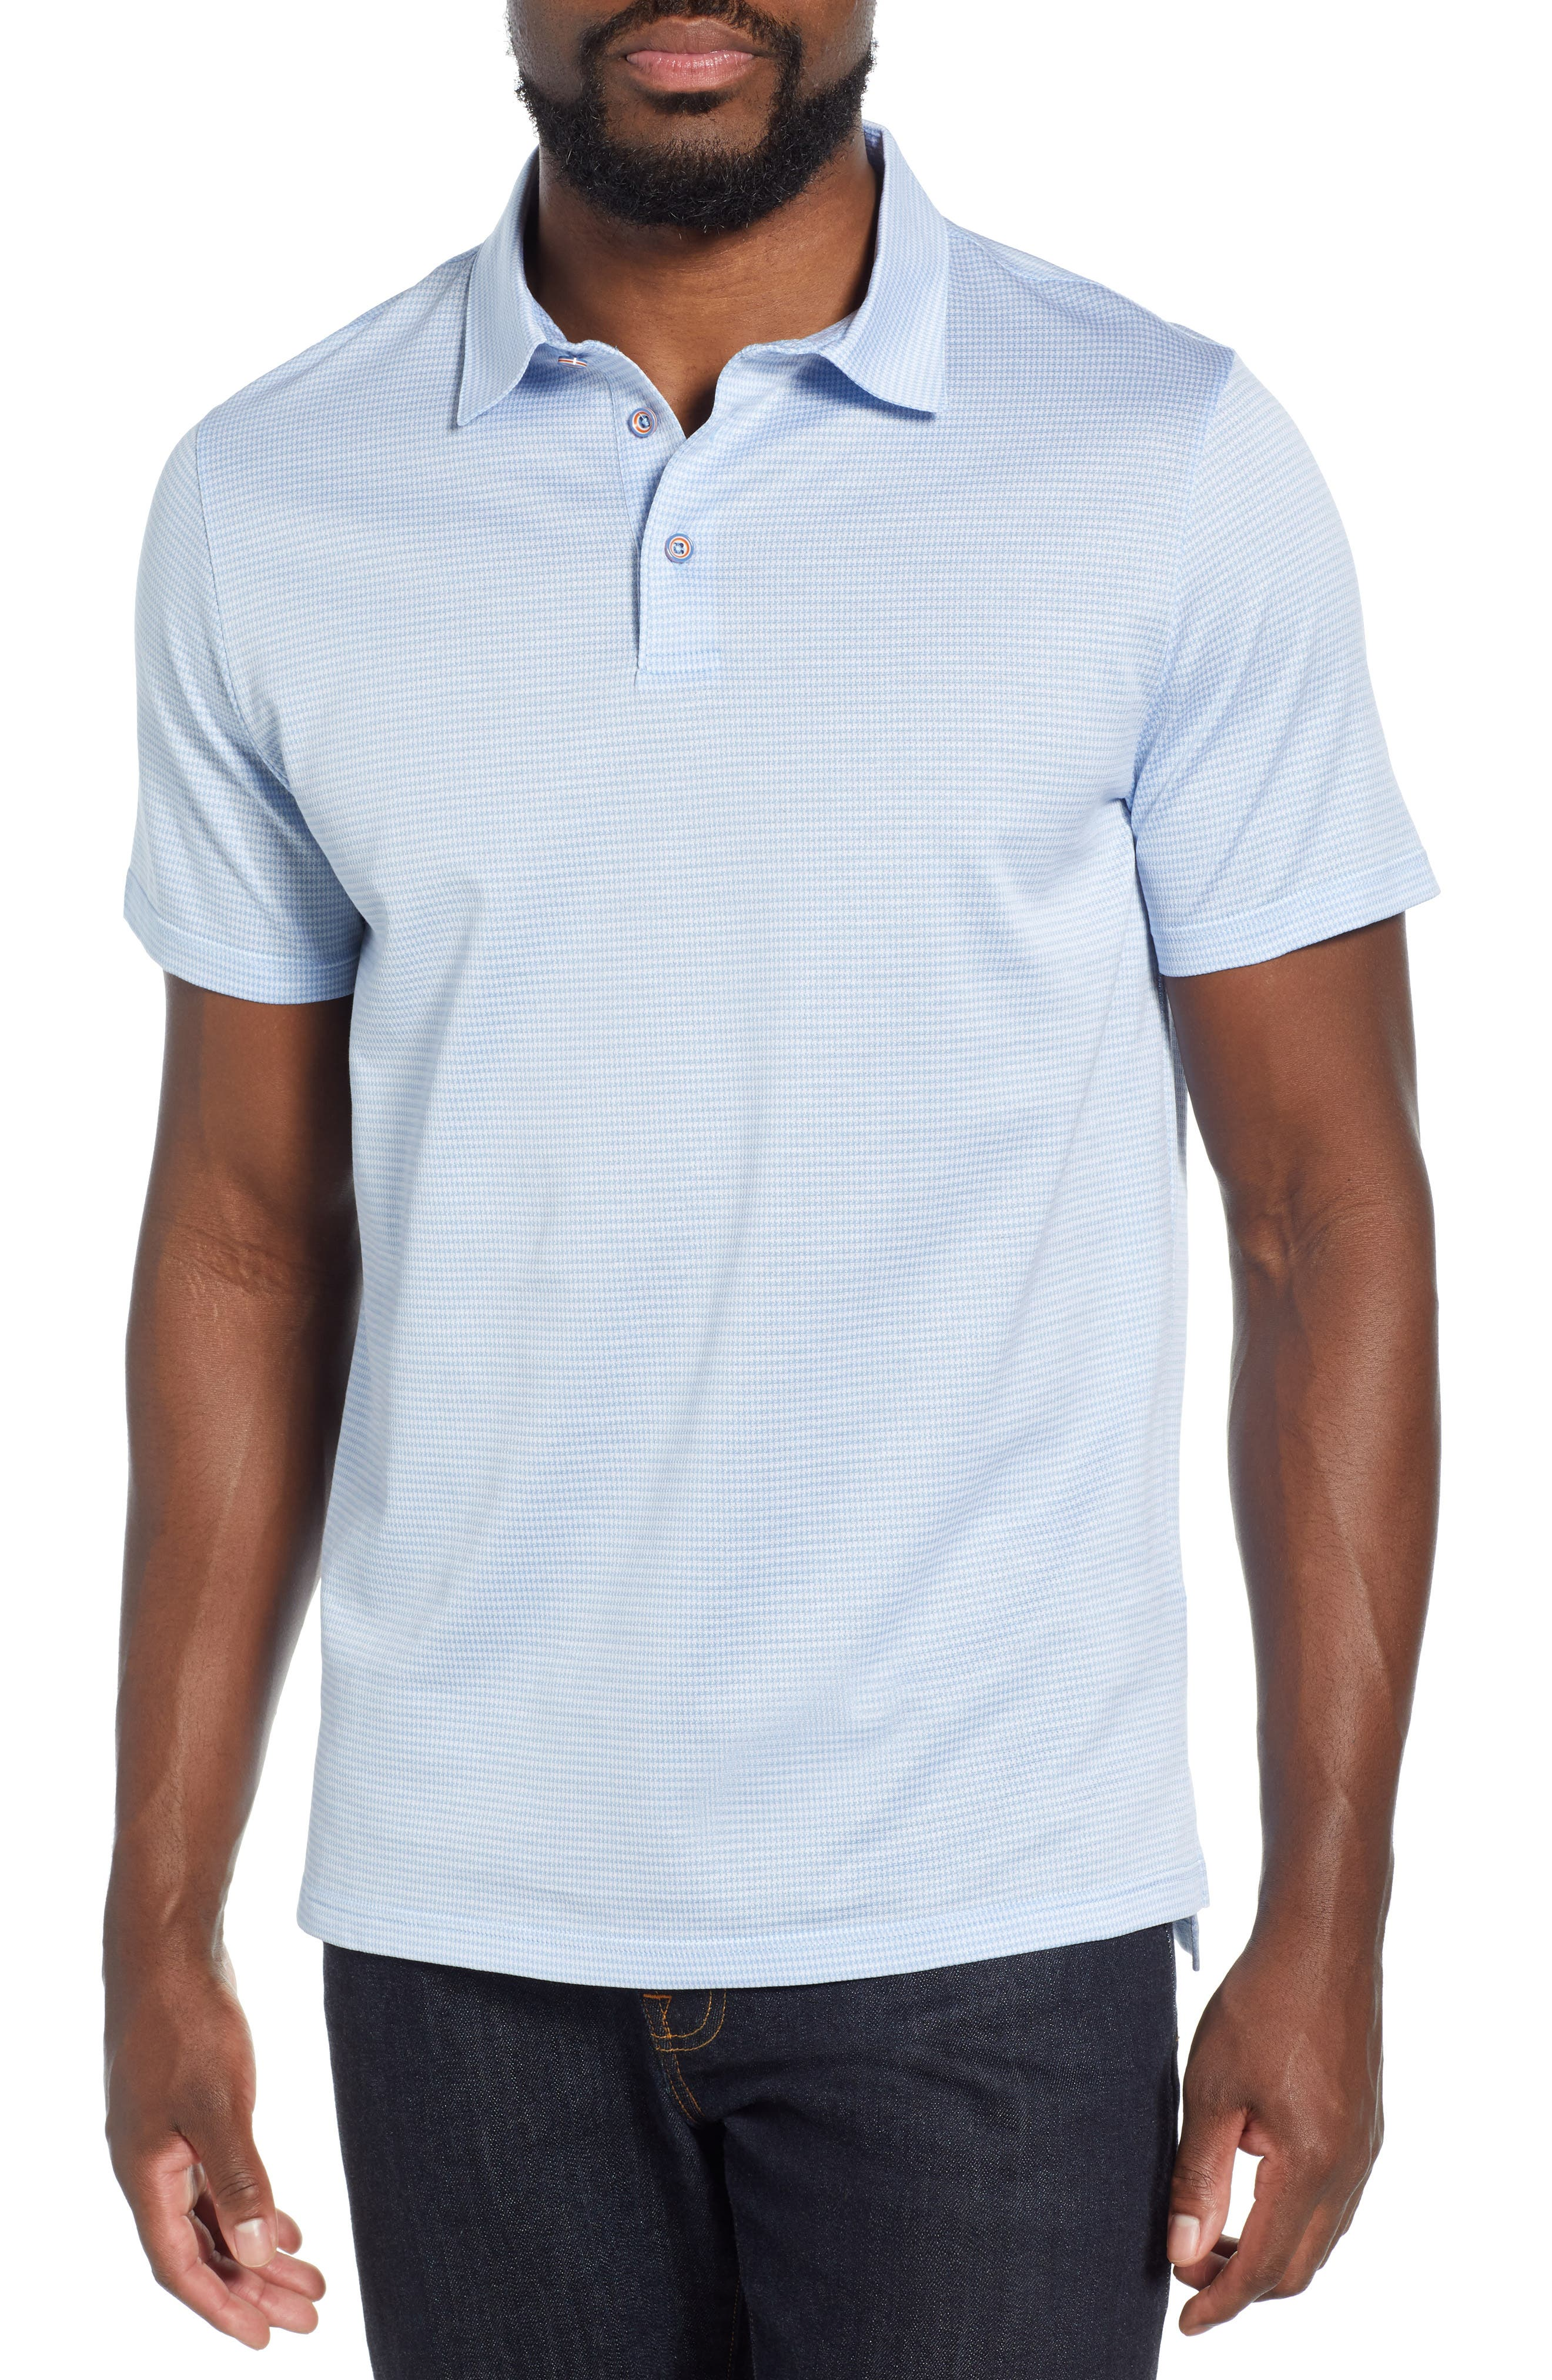 43bf2ad3 Men's Check & Plaid Polo Shirts | Nordstrom